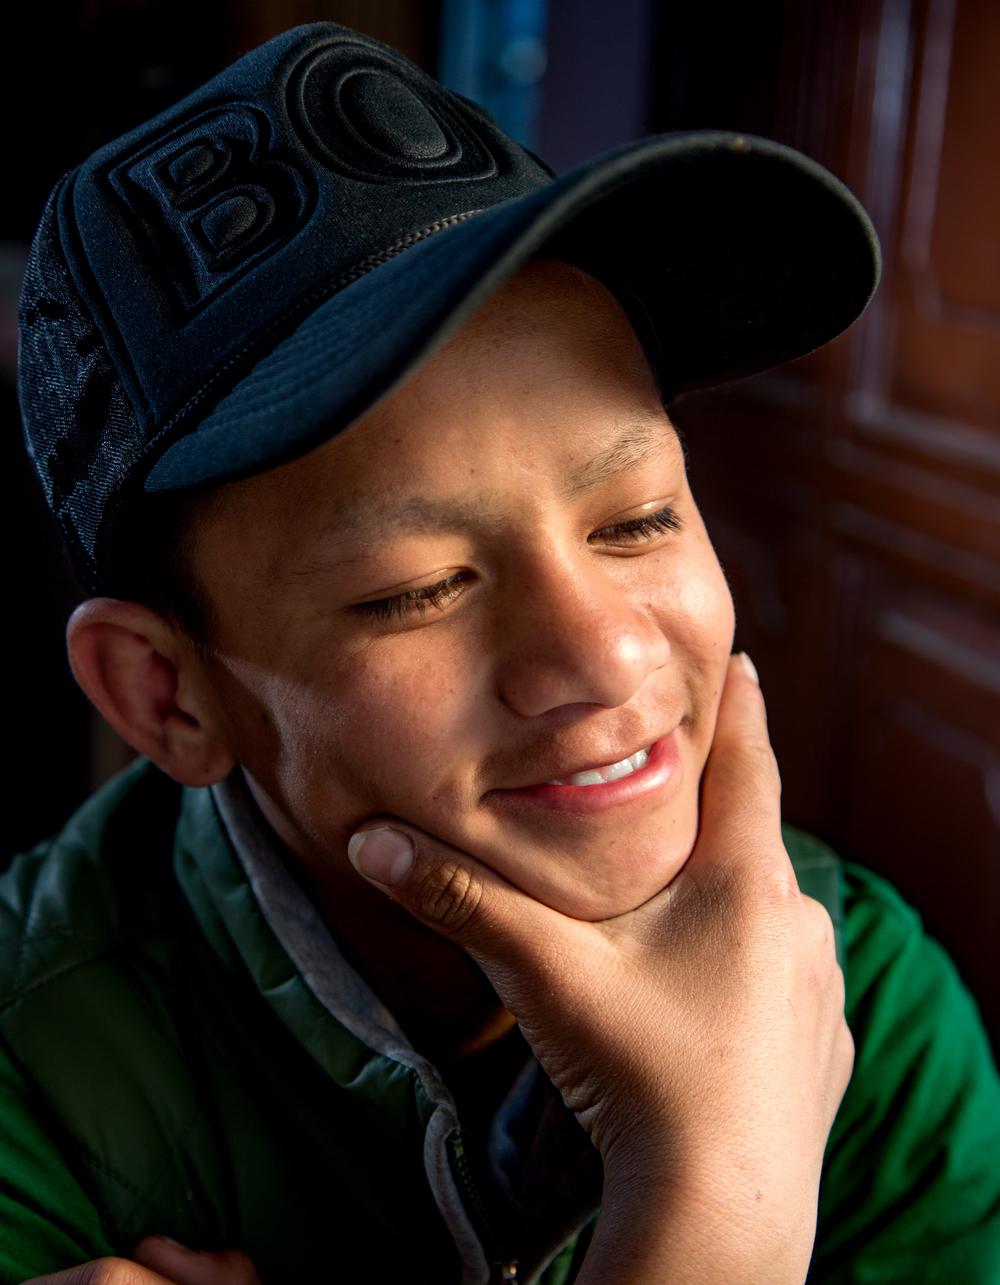 Nepal portrait 2-1.jpg